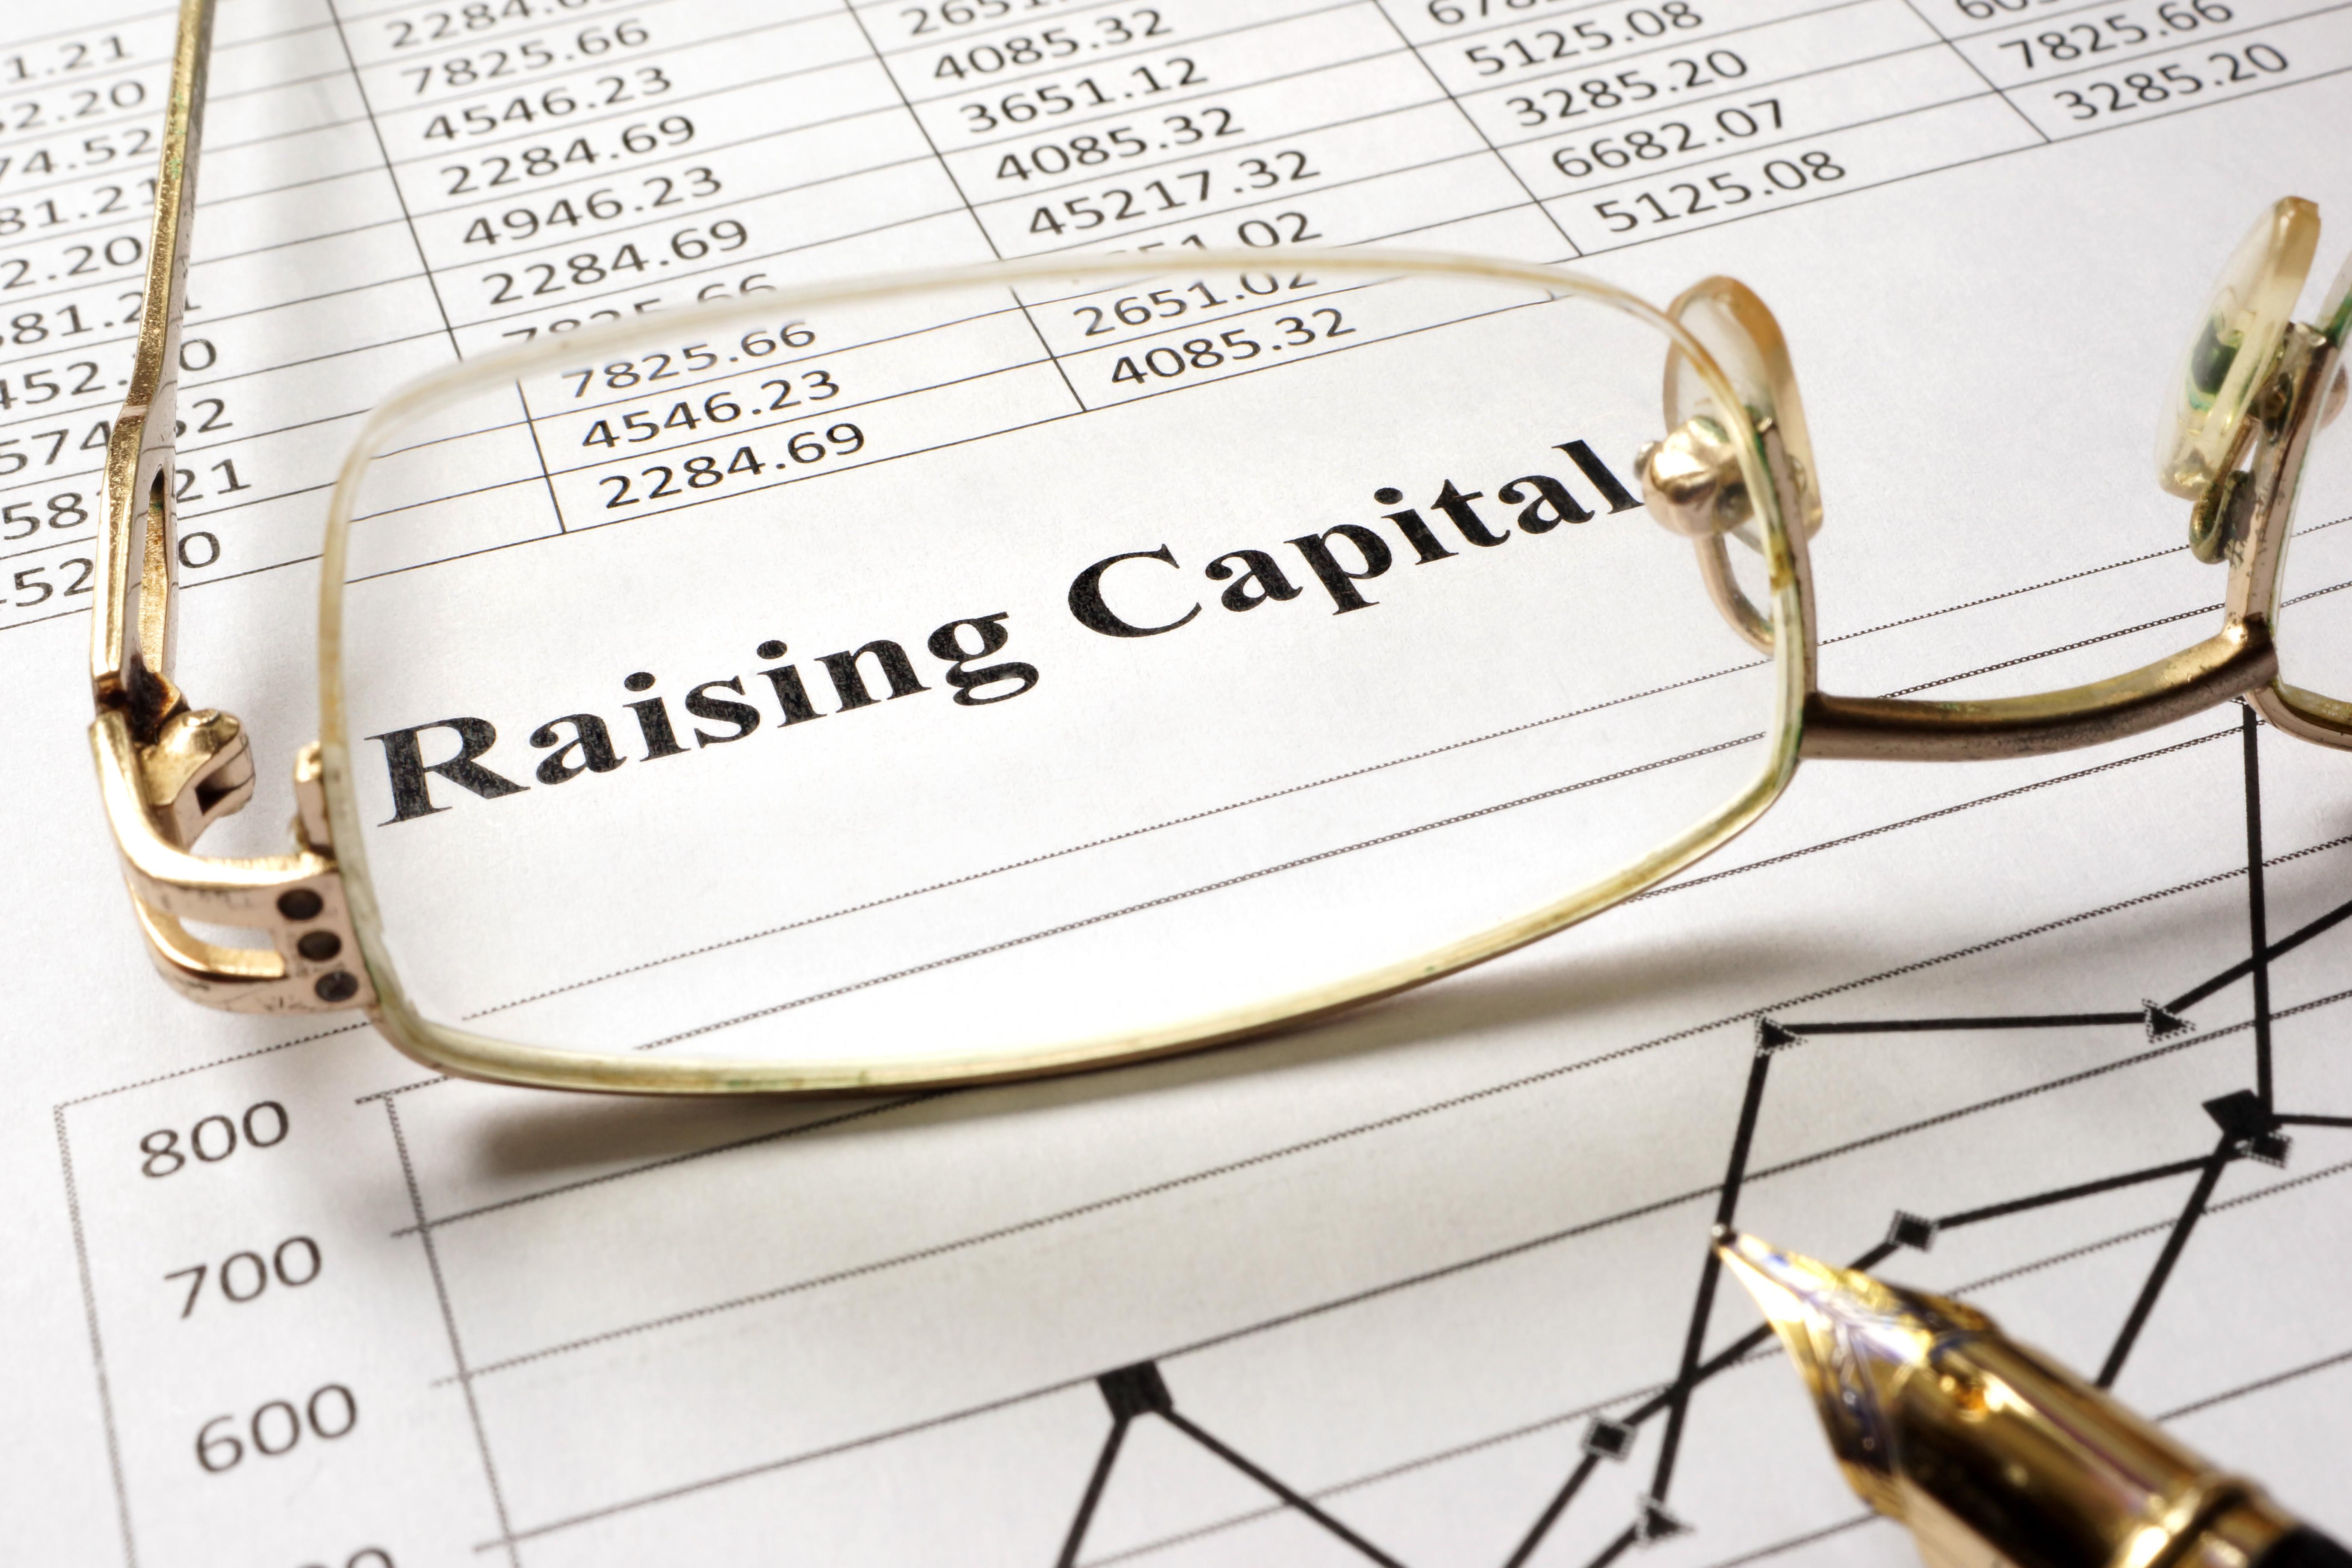 https://assets.sourcemedia.com/76/5c/4a60dd2f414c97c7a4d1d2b0d6ff/raising-capital-adobe.jpg